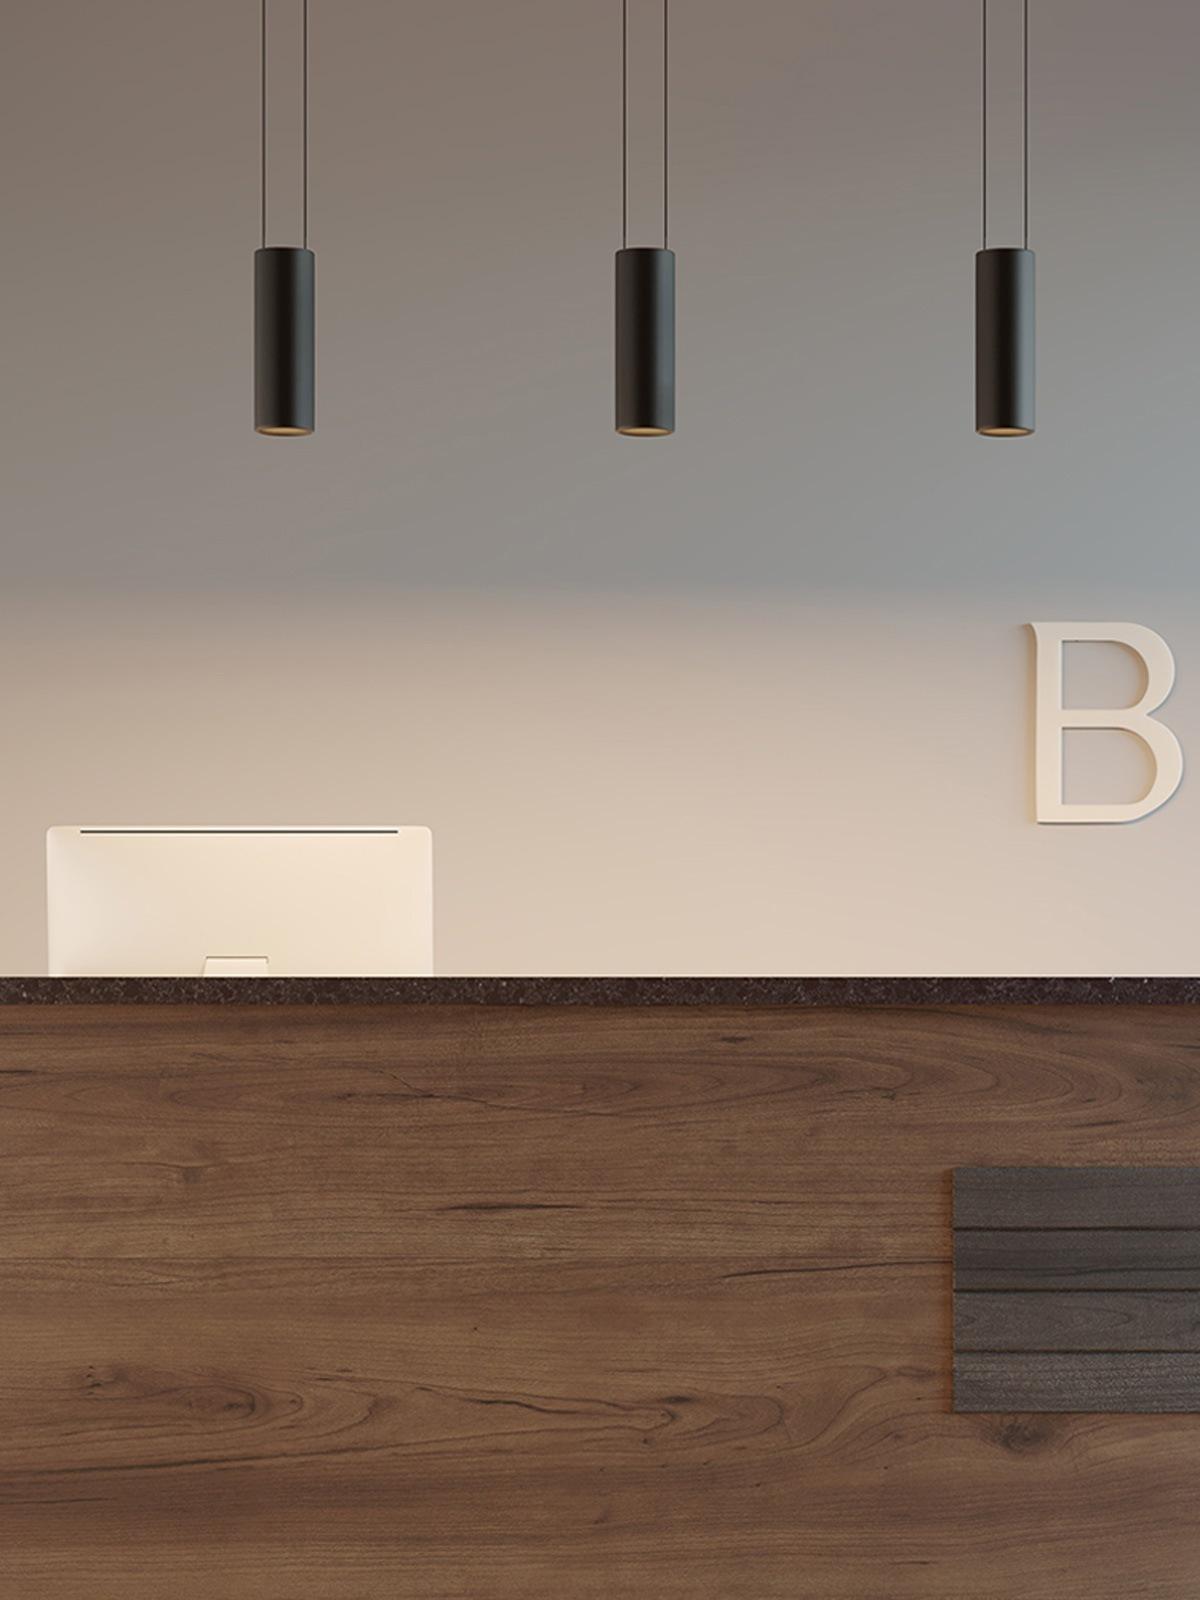 BYOK Tubina LED Leuchte DesignOrt Onlinehsop Lampen Berlin